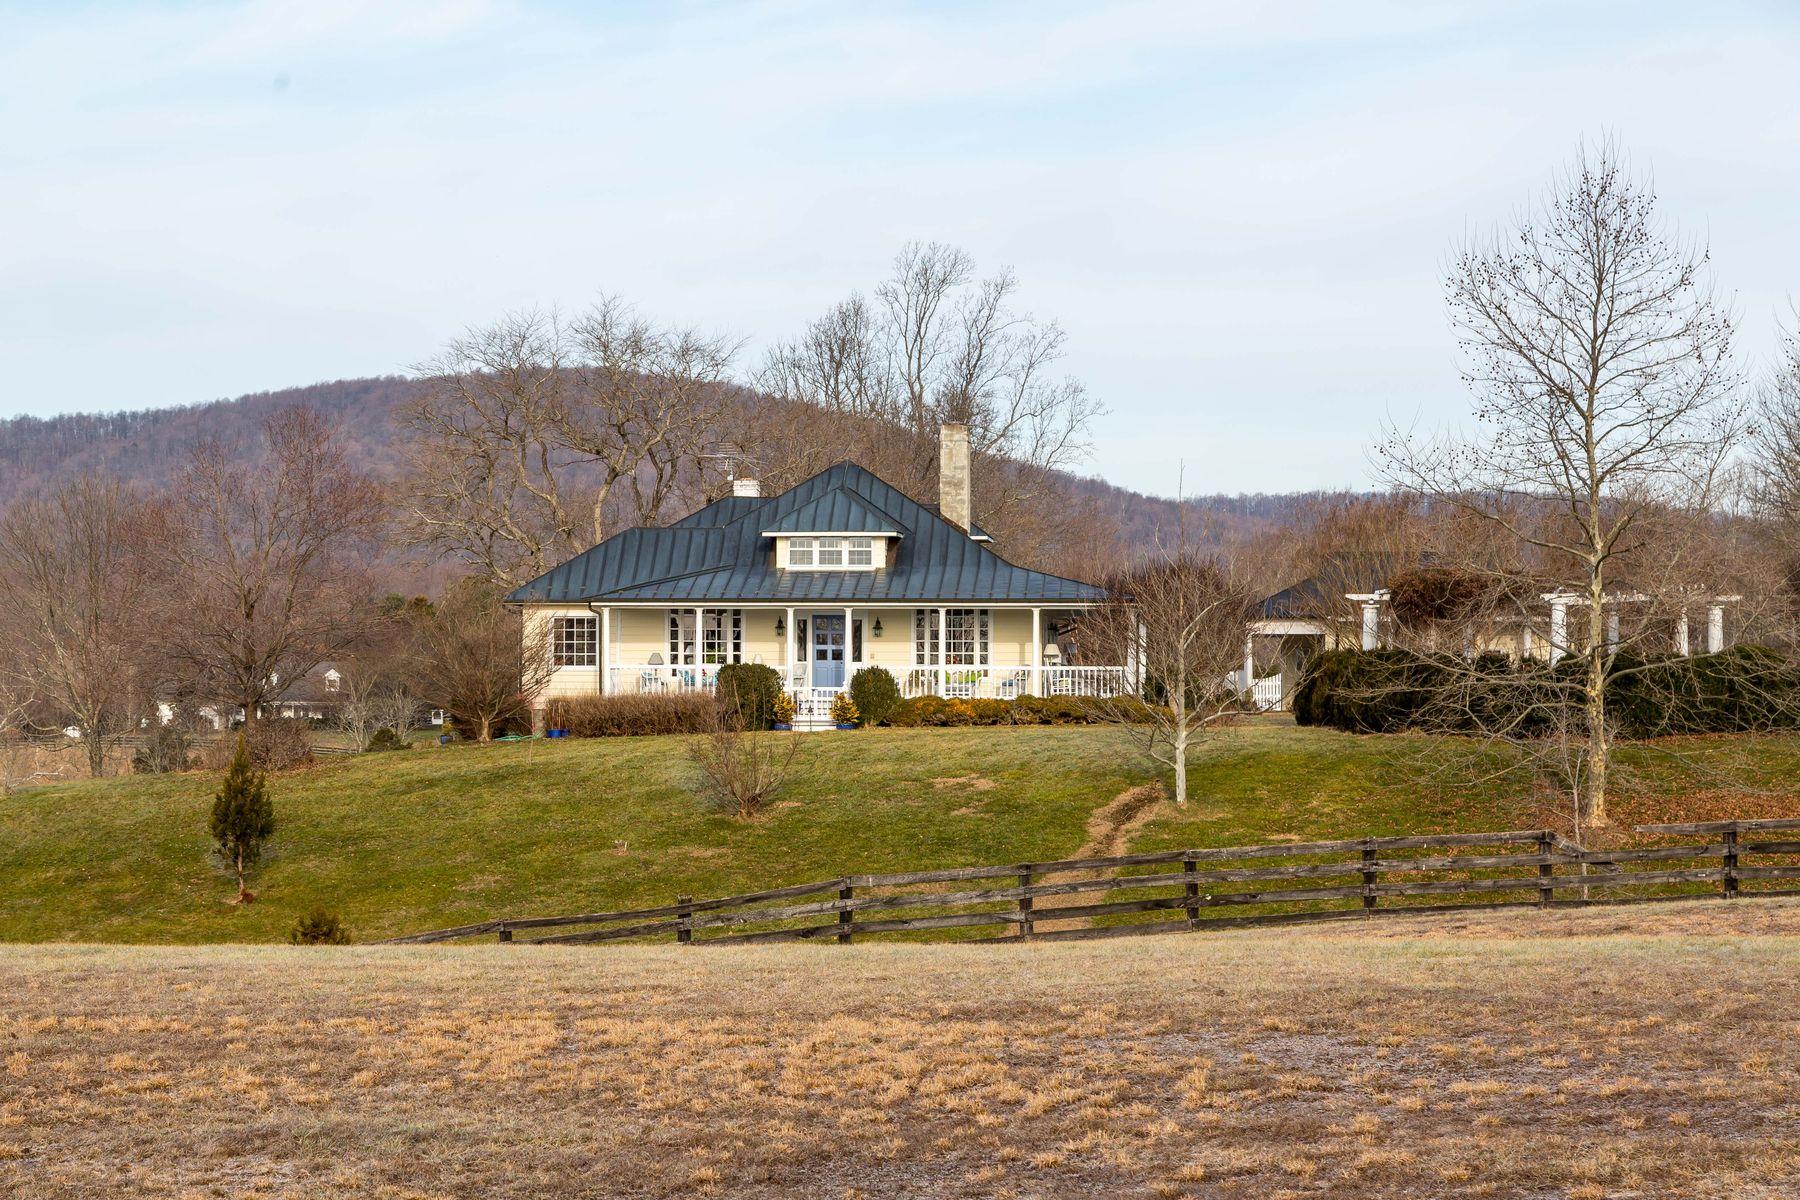 Single Family Home for Sale at Linden Ridge 1750 St. John Road Keswick, Virginia 22947 United States